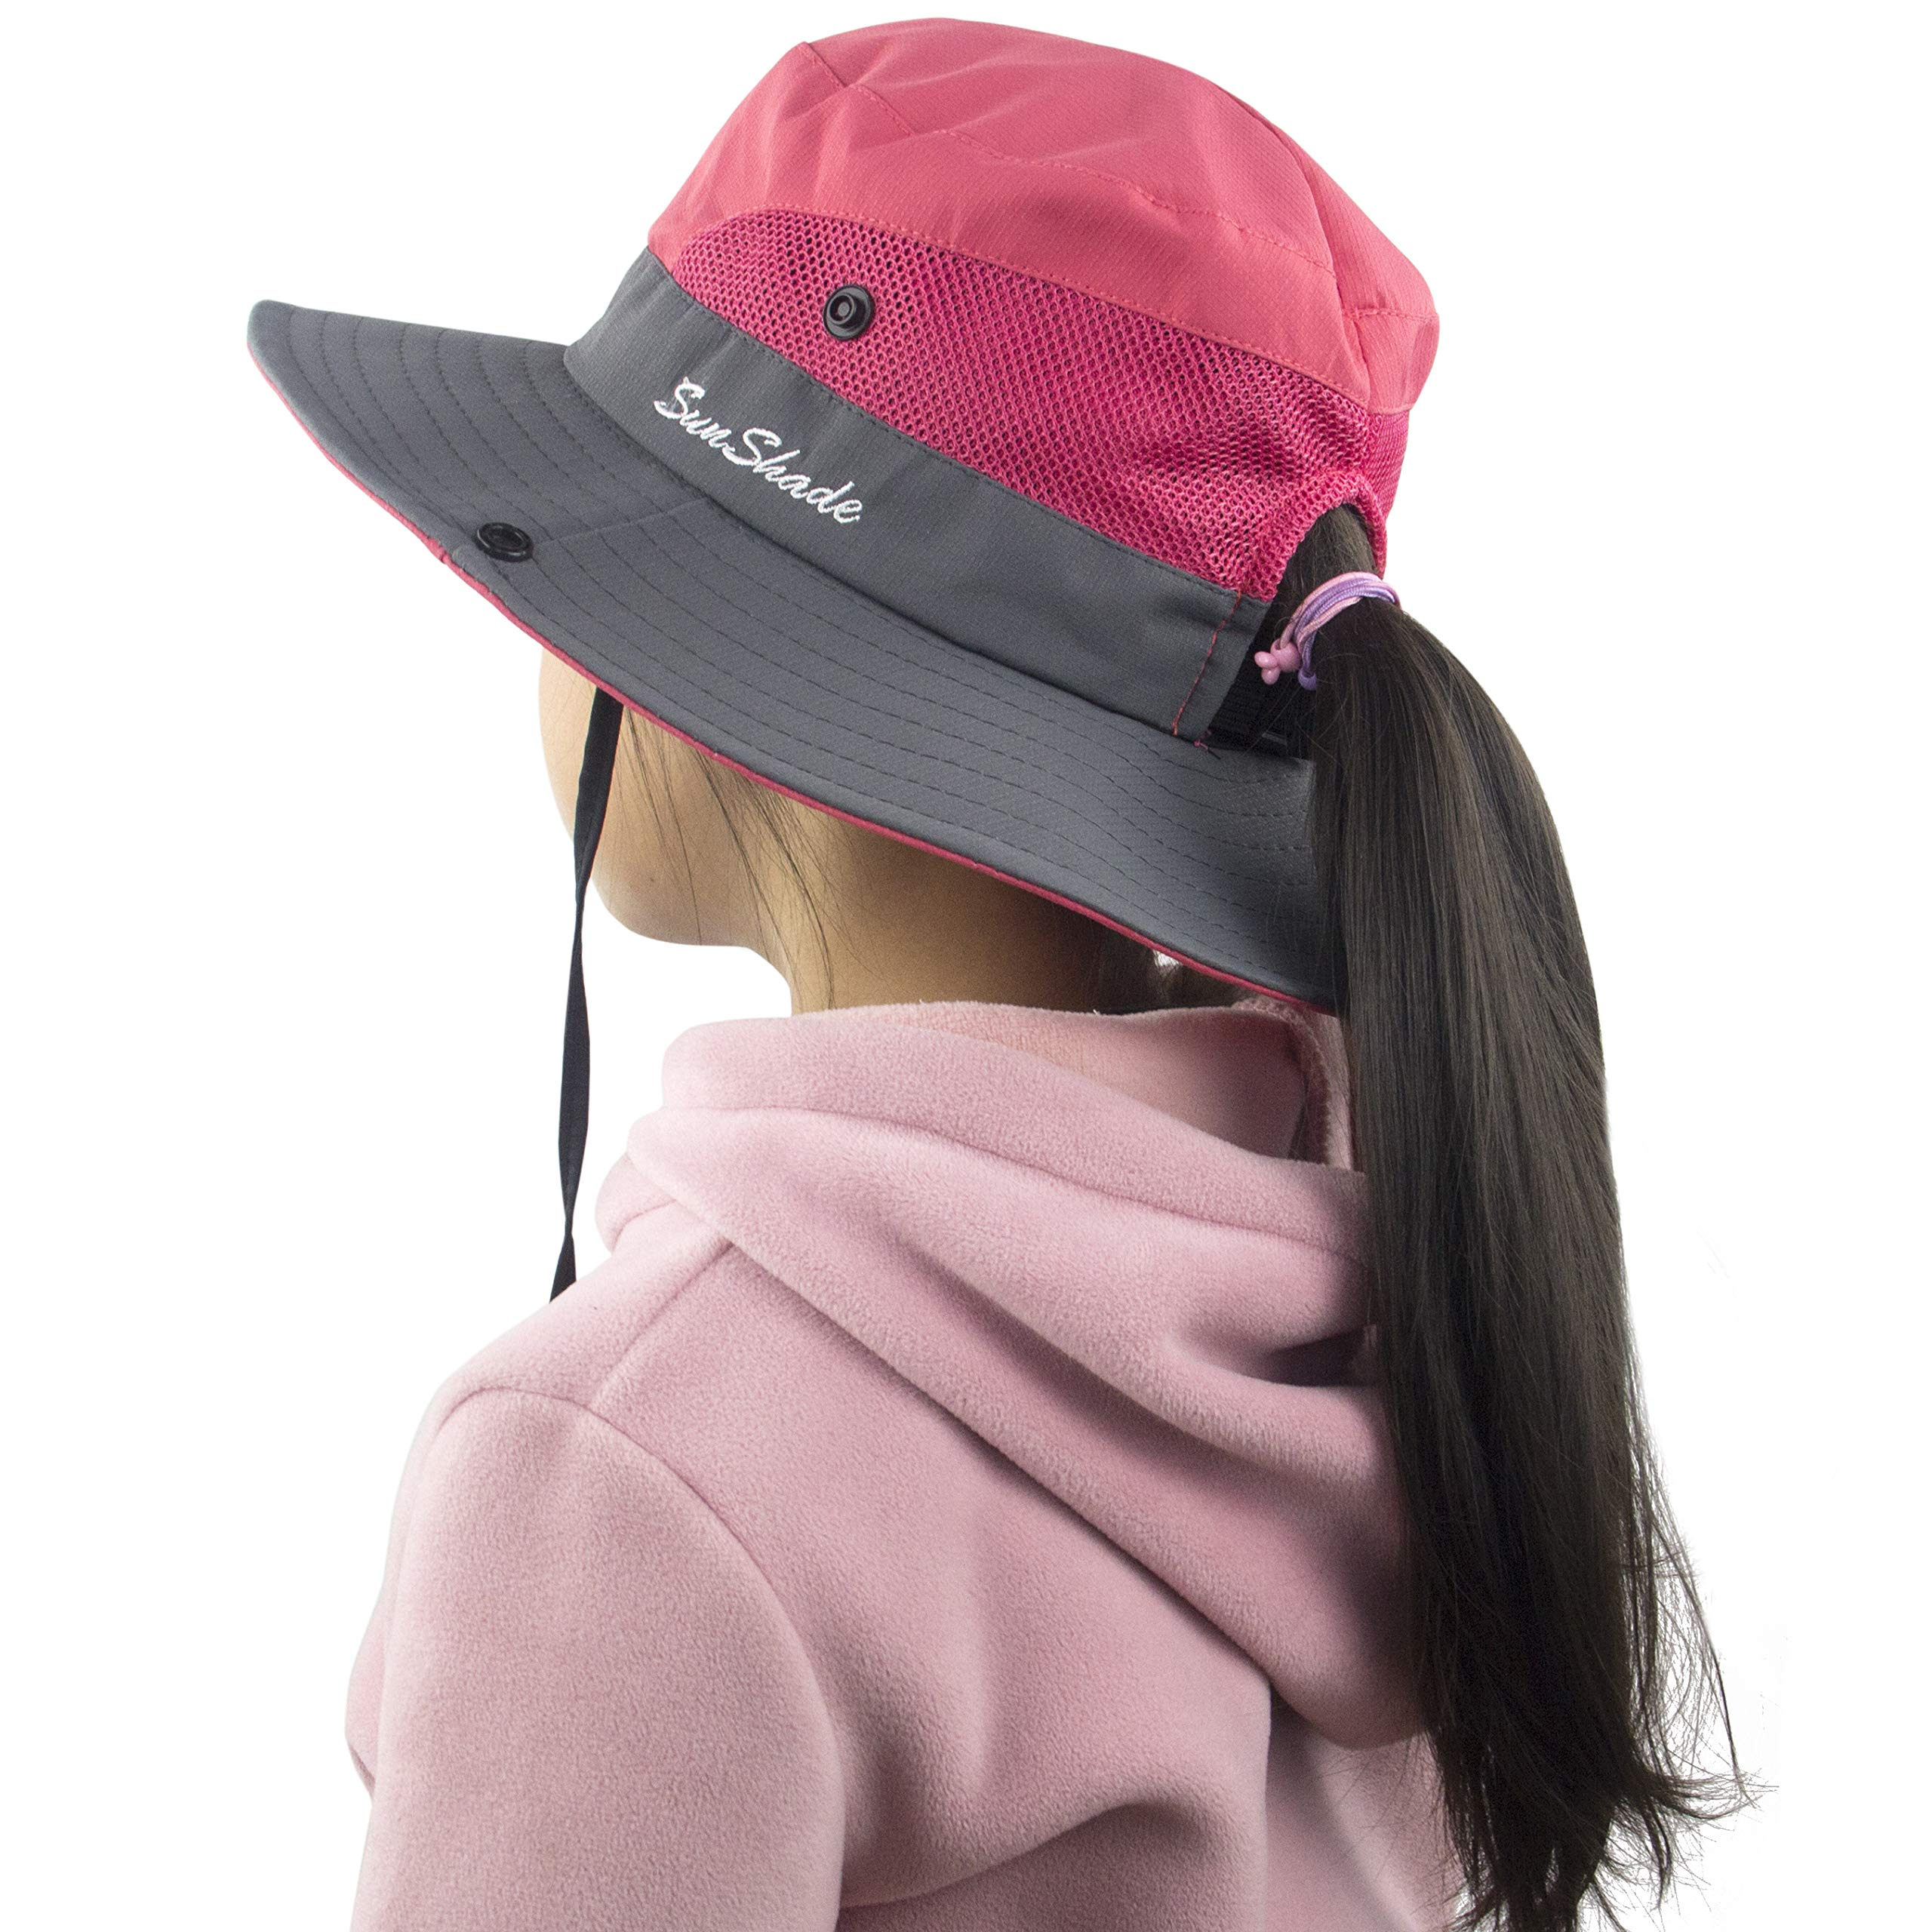 Muryobao Toddler Child Kids Girls Summer Sun Hat Wide Brim UV Protection Hats Floppy Bucket Cap for Beach Fishing Gardening Watermelon Red by Muryobao